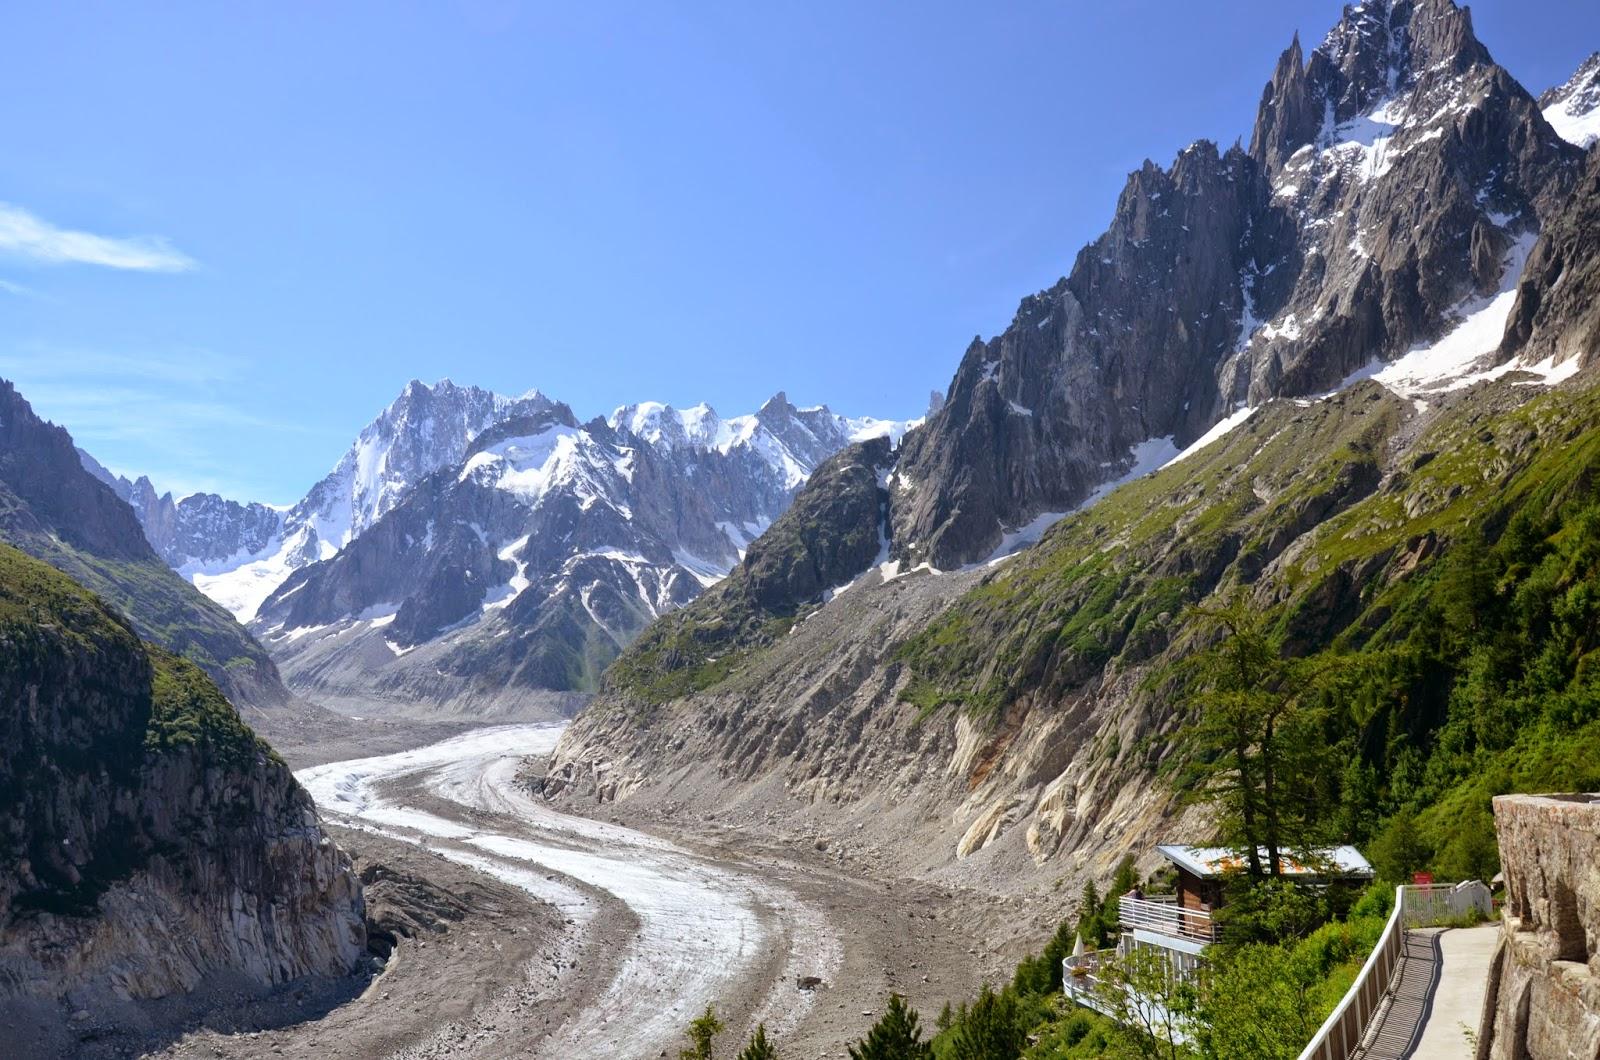 baugh s blog photo essay walking inside a glacier near chamonix photo essay walking inside a glacier near chamonix